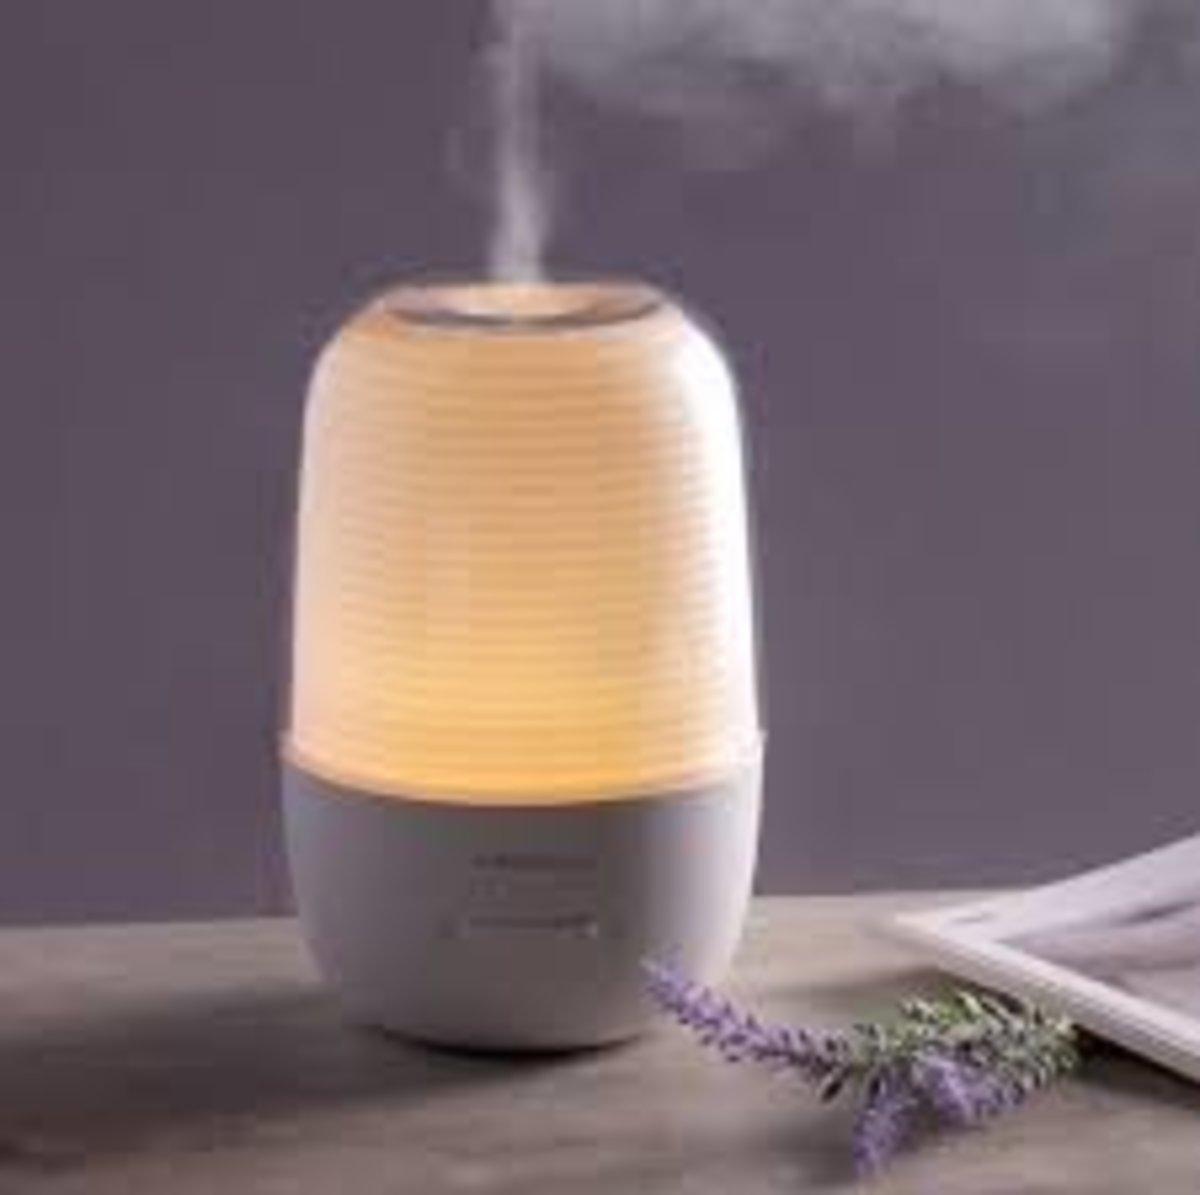 Feel 空氣加濕香薰燈